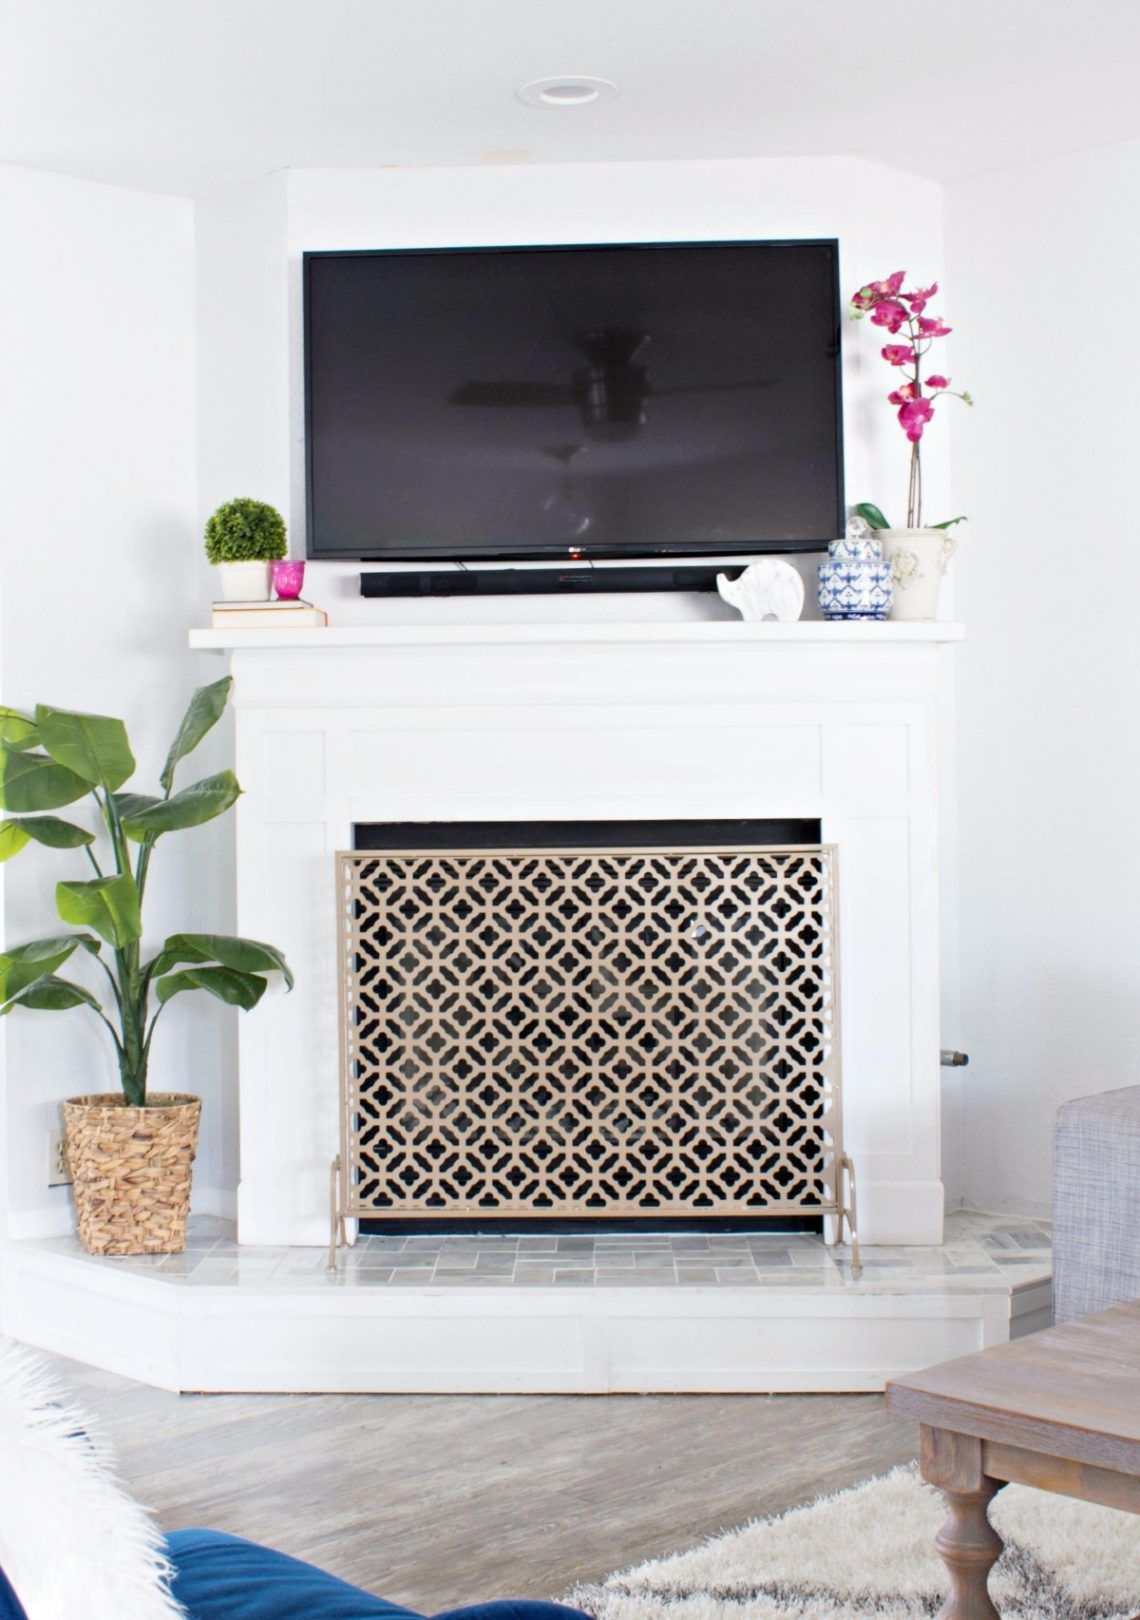 Design Home Idea DIY *** Click image to read more details ...